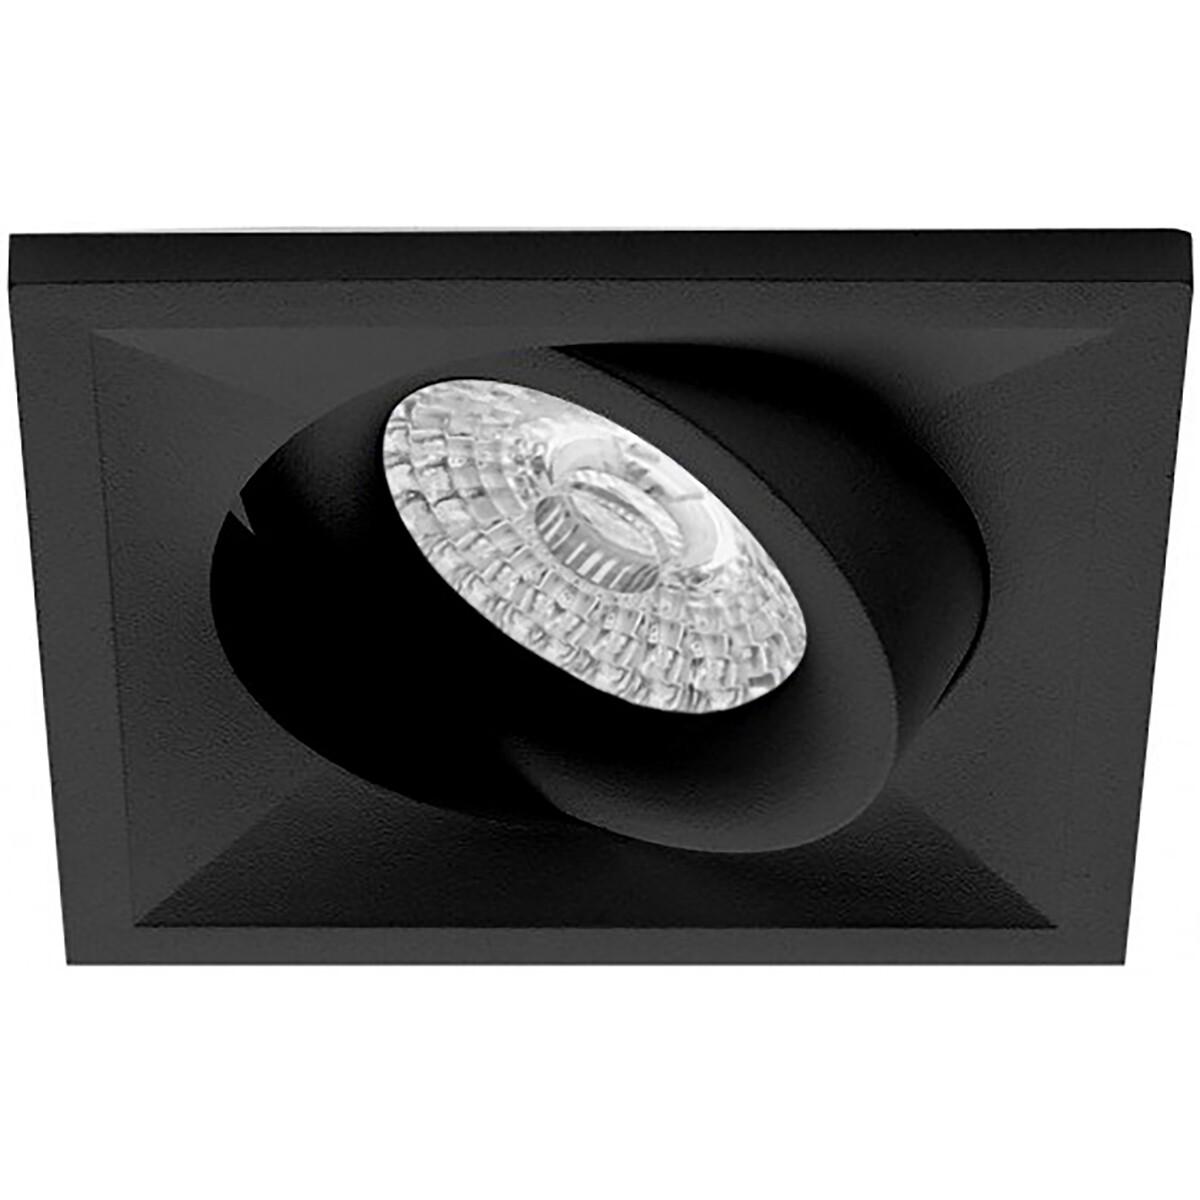 Spot Armatuur GU10 - Pragmi Qiundo Pro - Inbouw Vierkant - Mat Zwart - Aluminium - Kantelbaar - 80mm